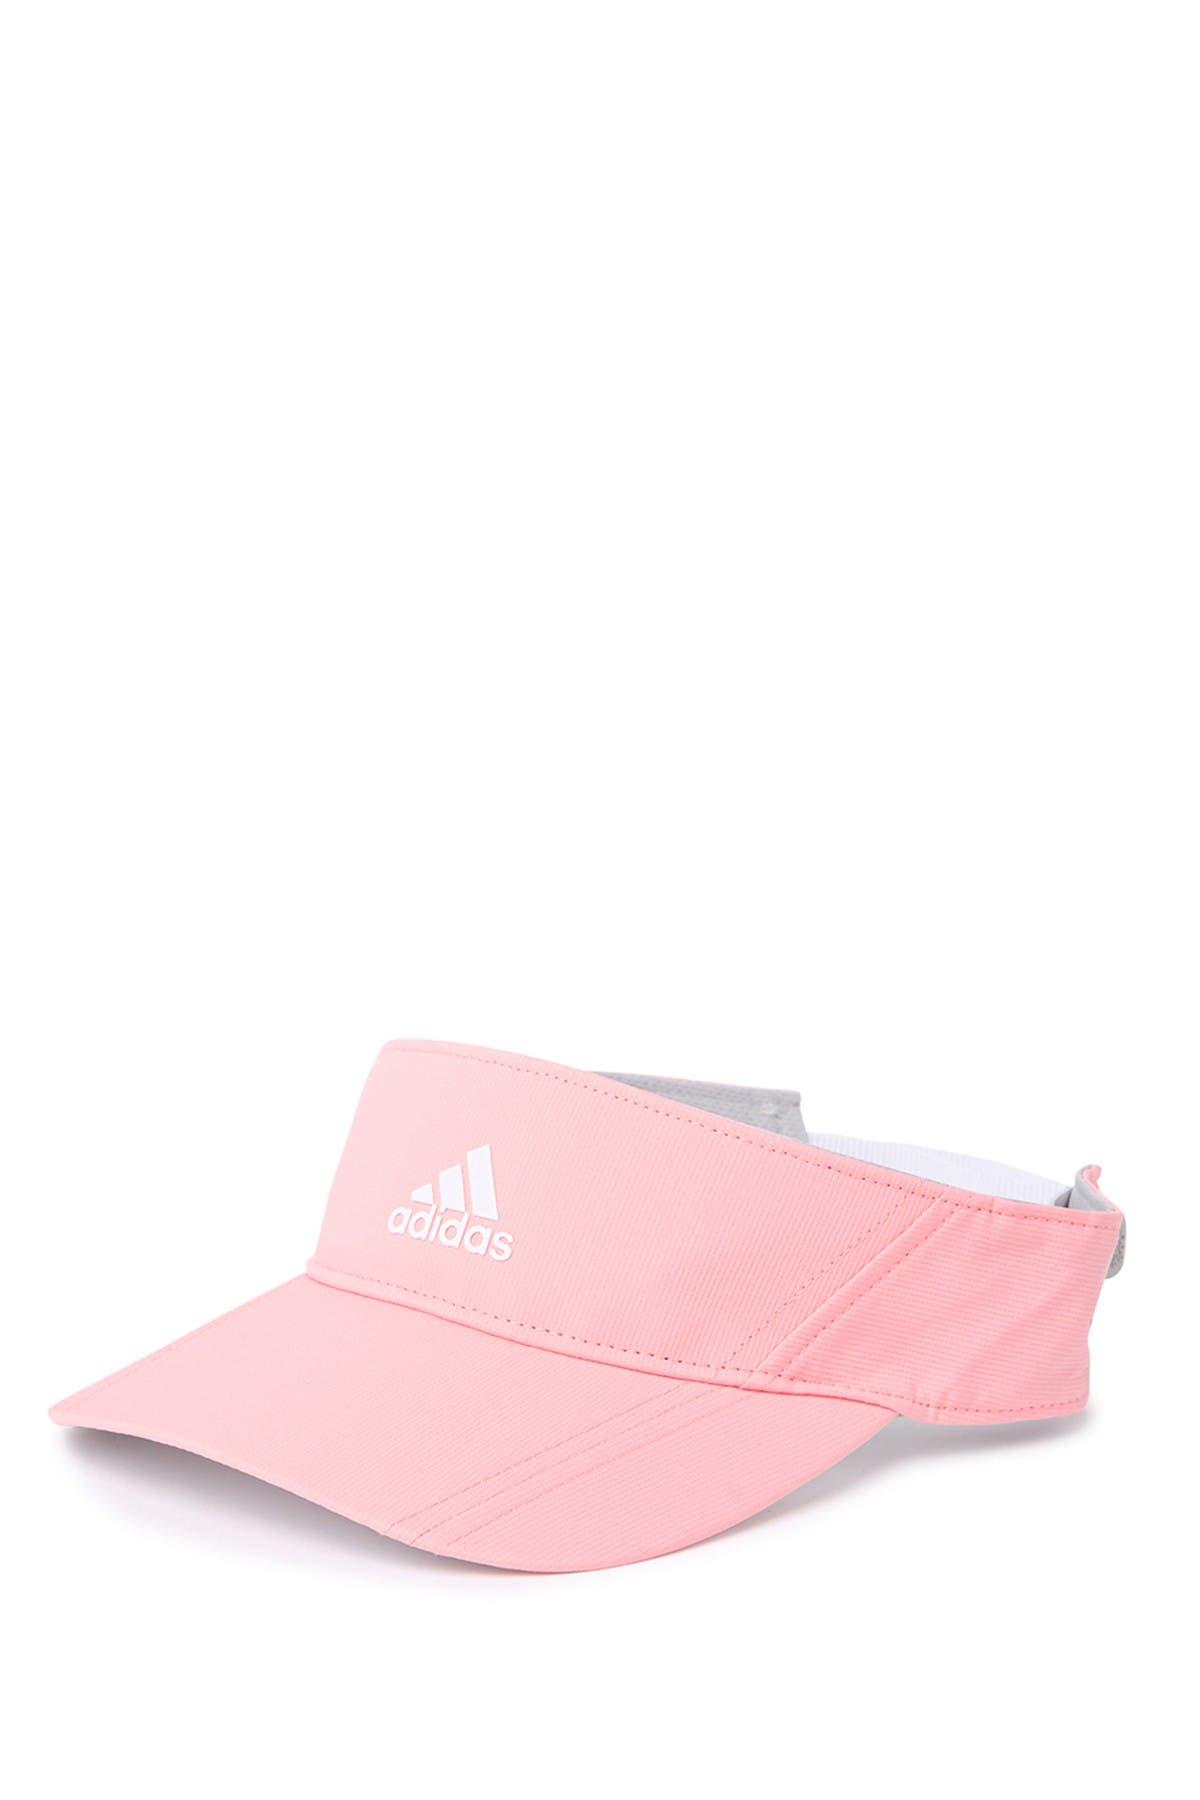 Image of Adidas Golf Comfort Visor